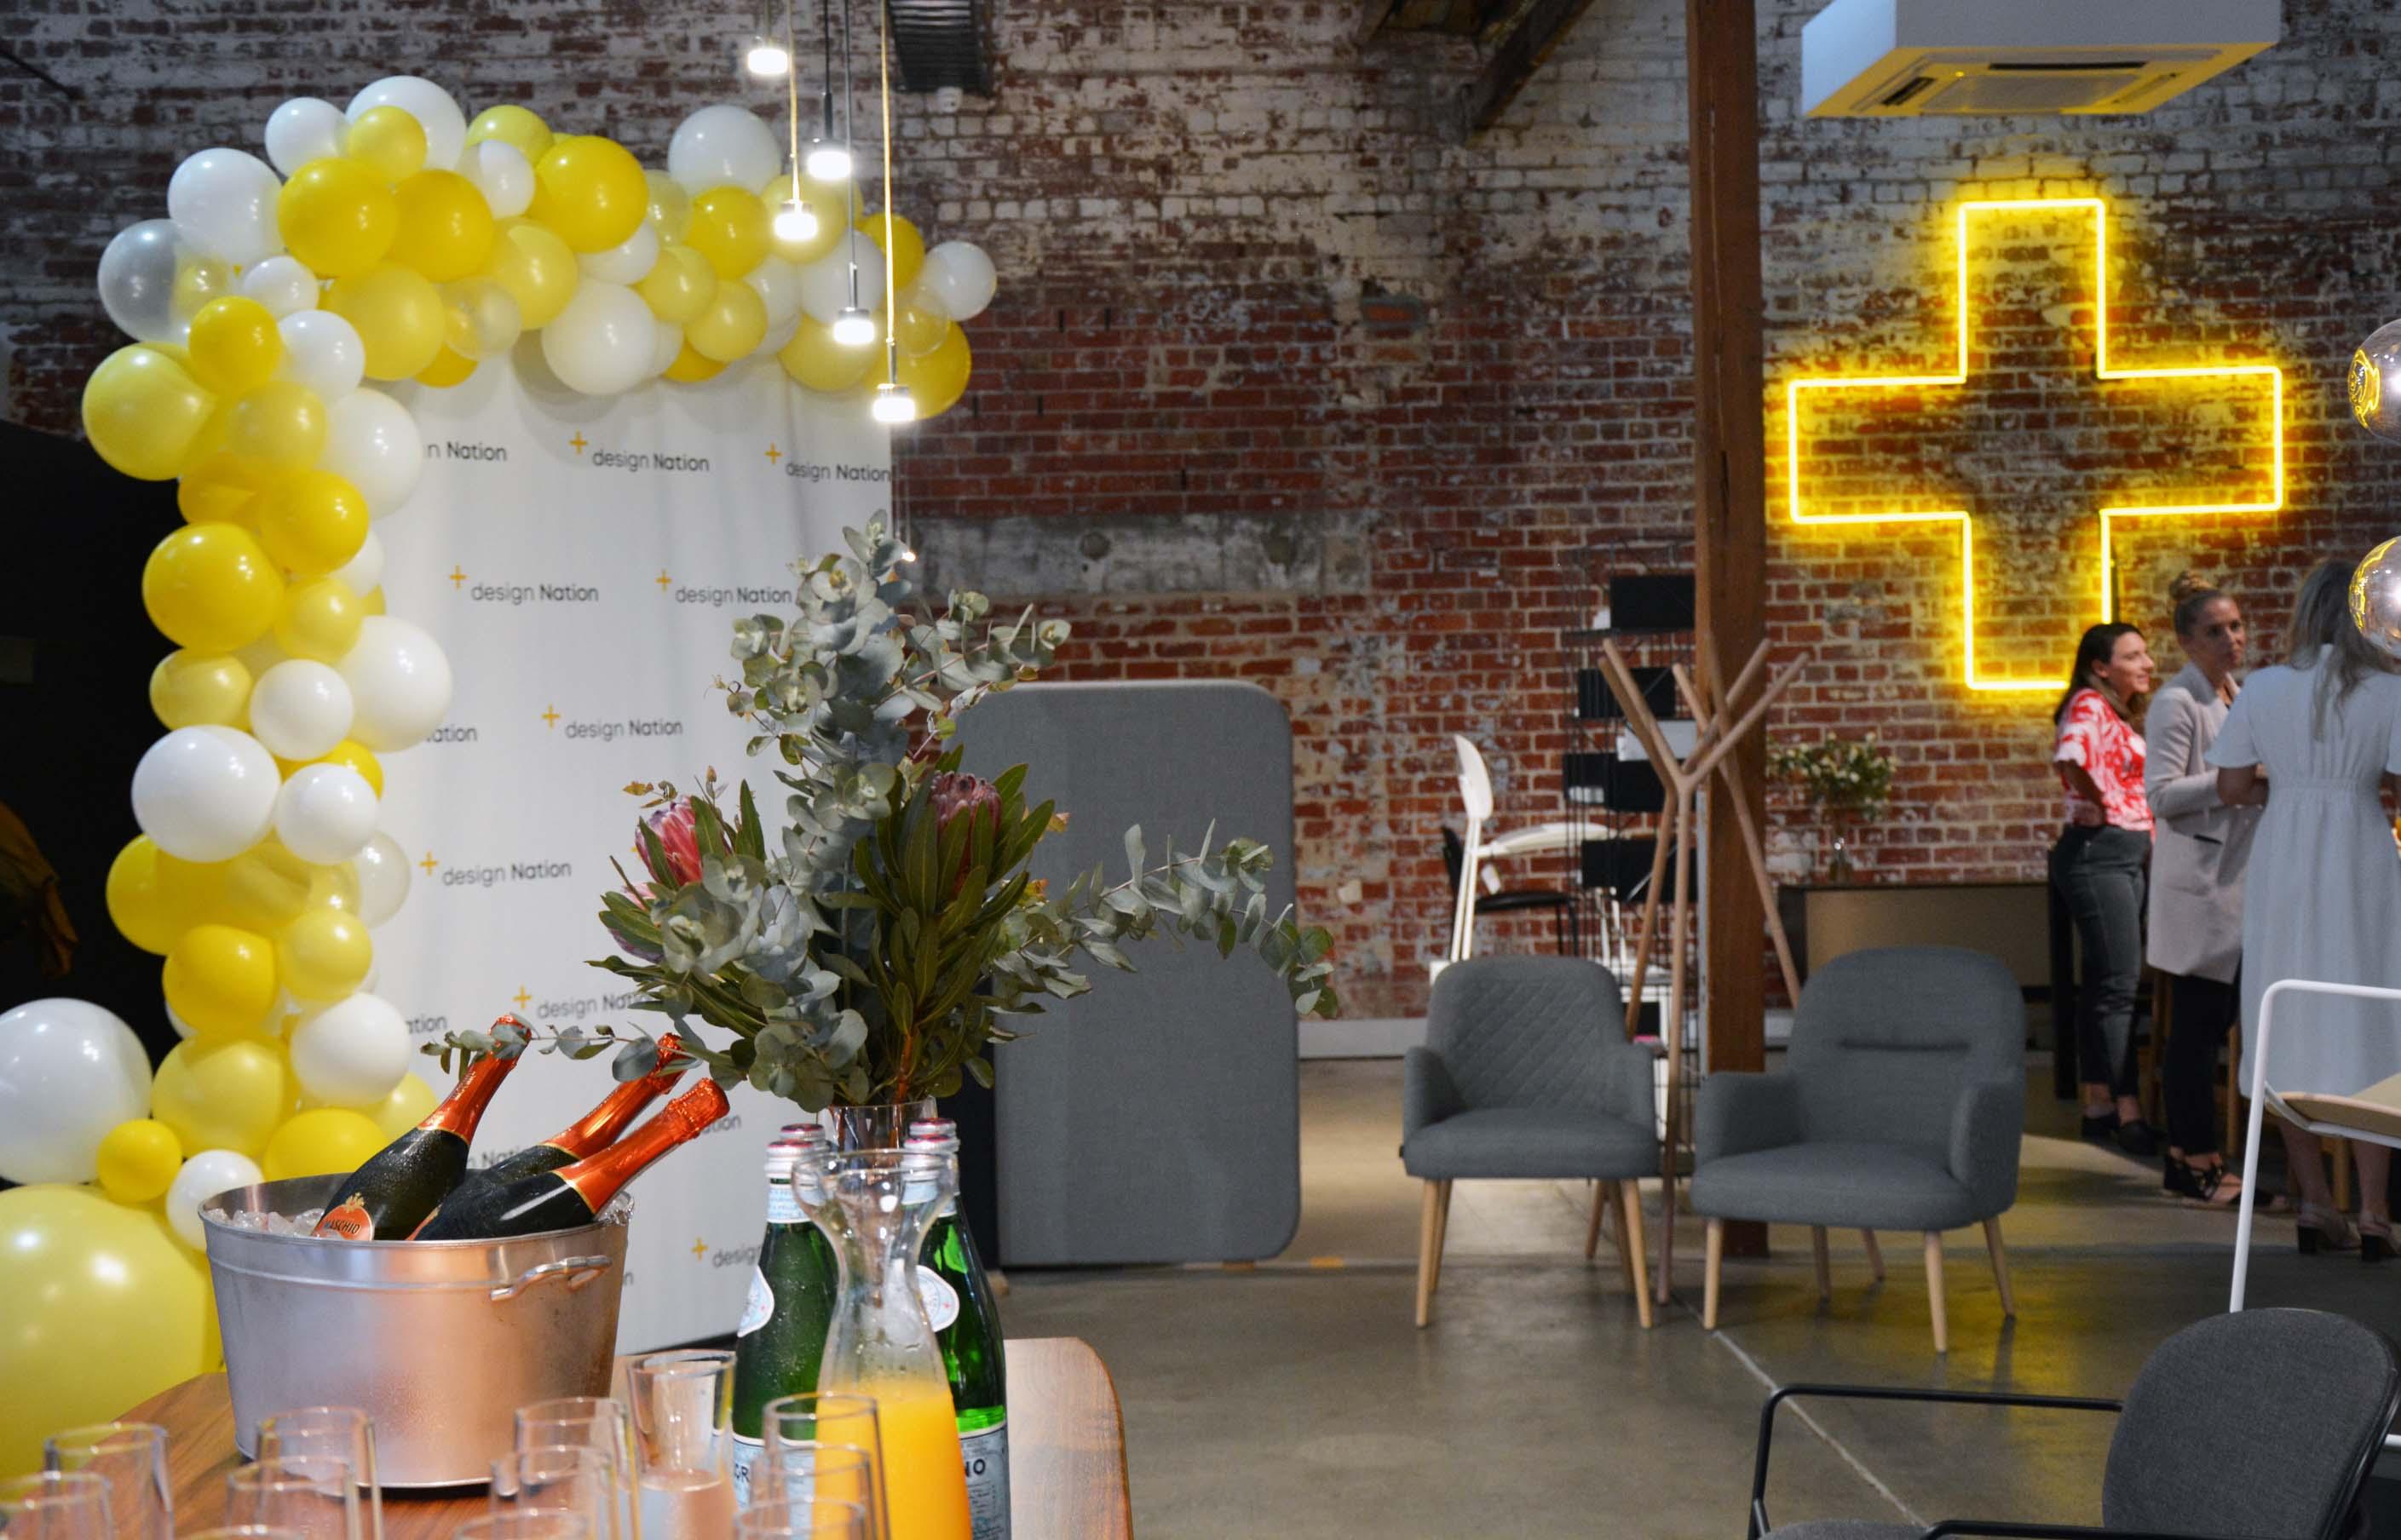 DNA_Melbourne_Launch_event (9)